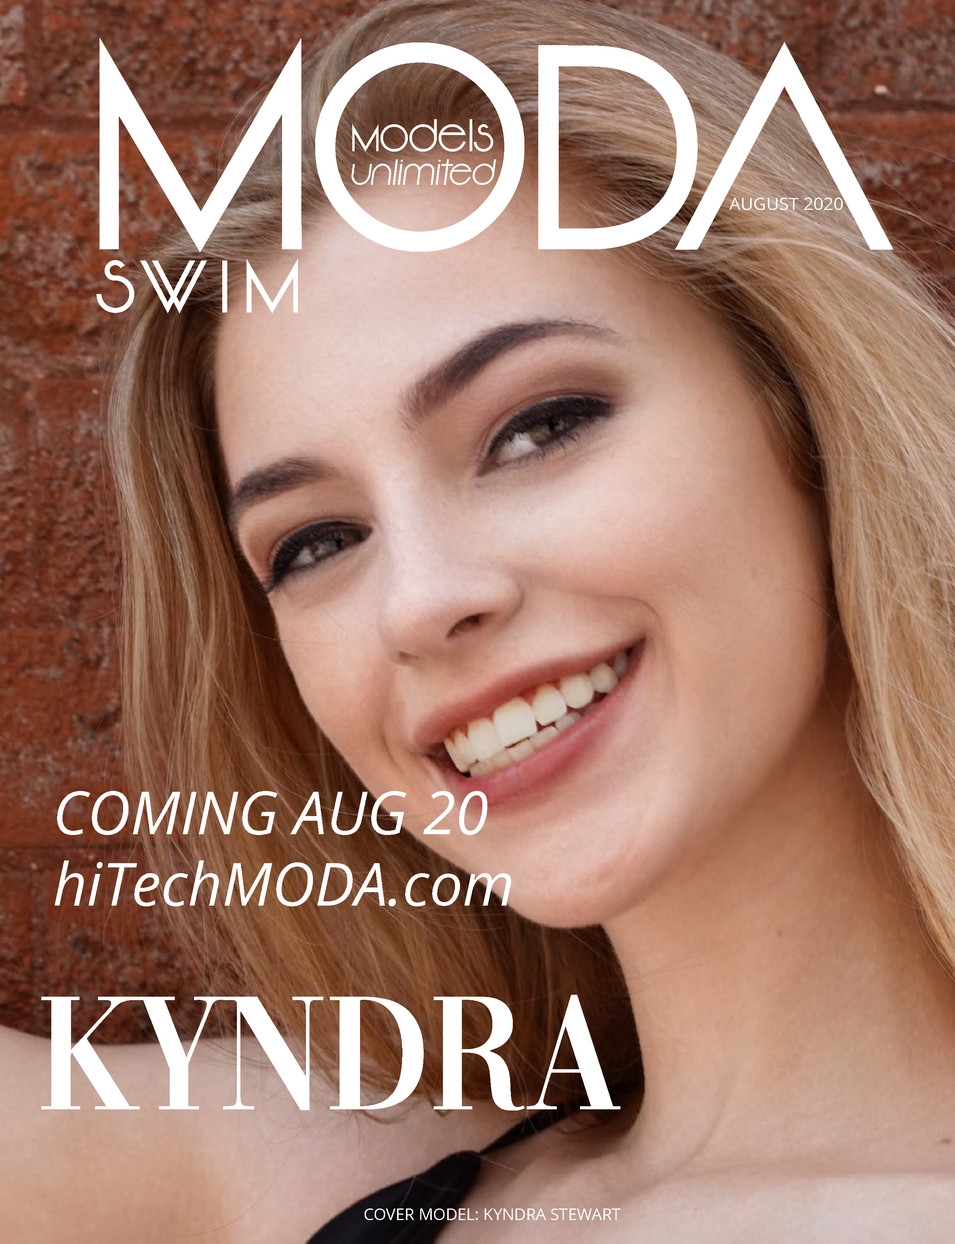 Moda Models Unlimited Swim Issue Kyndra